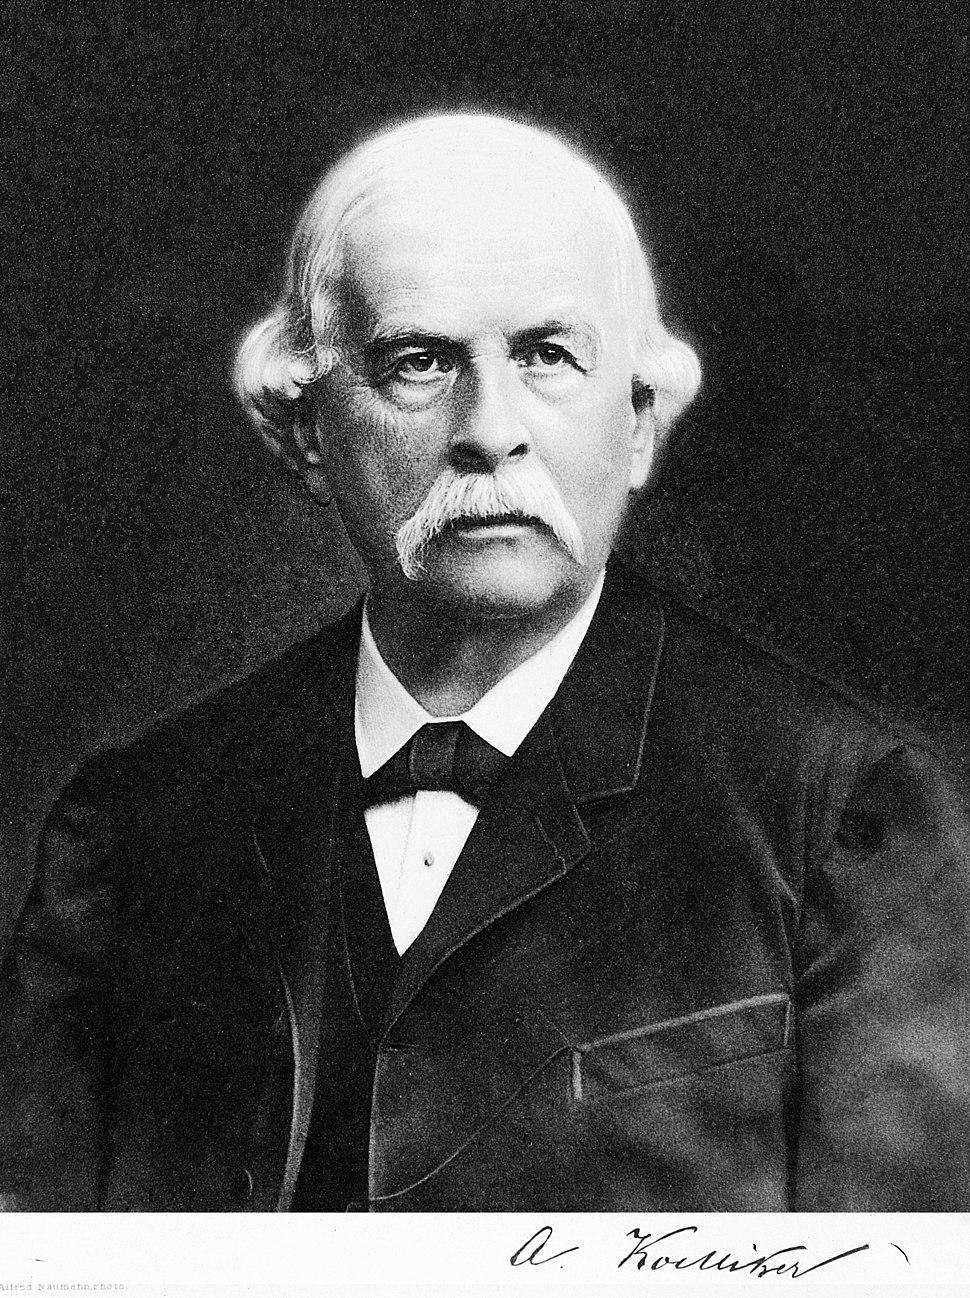 Kölliker Rudolph Albert von 1818-1902